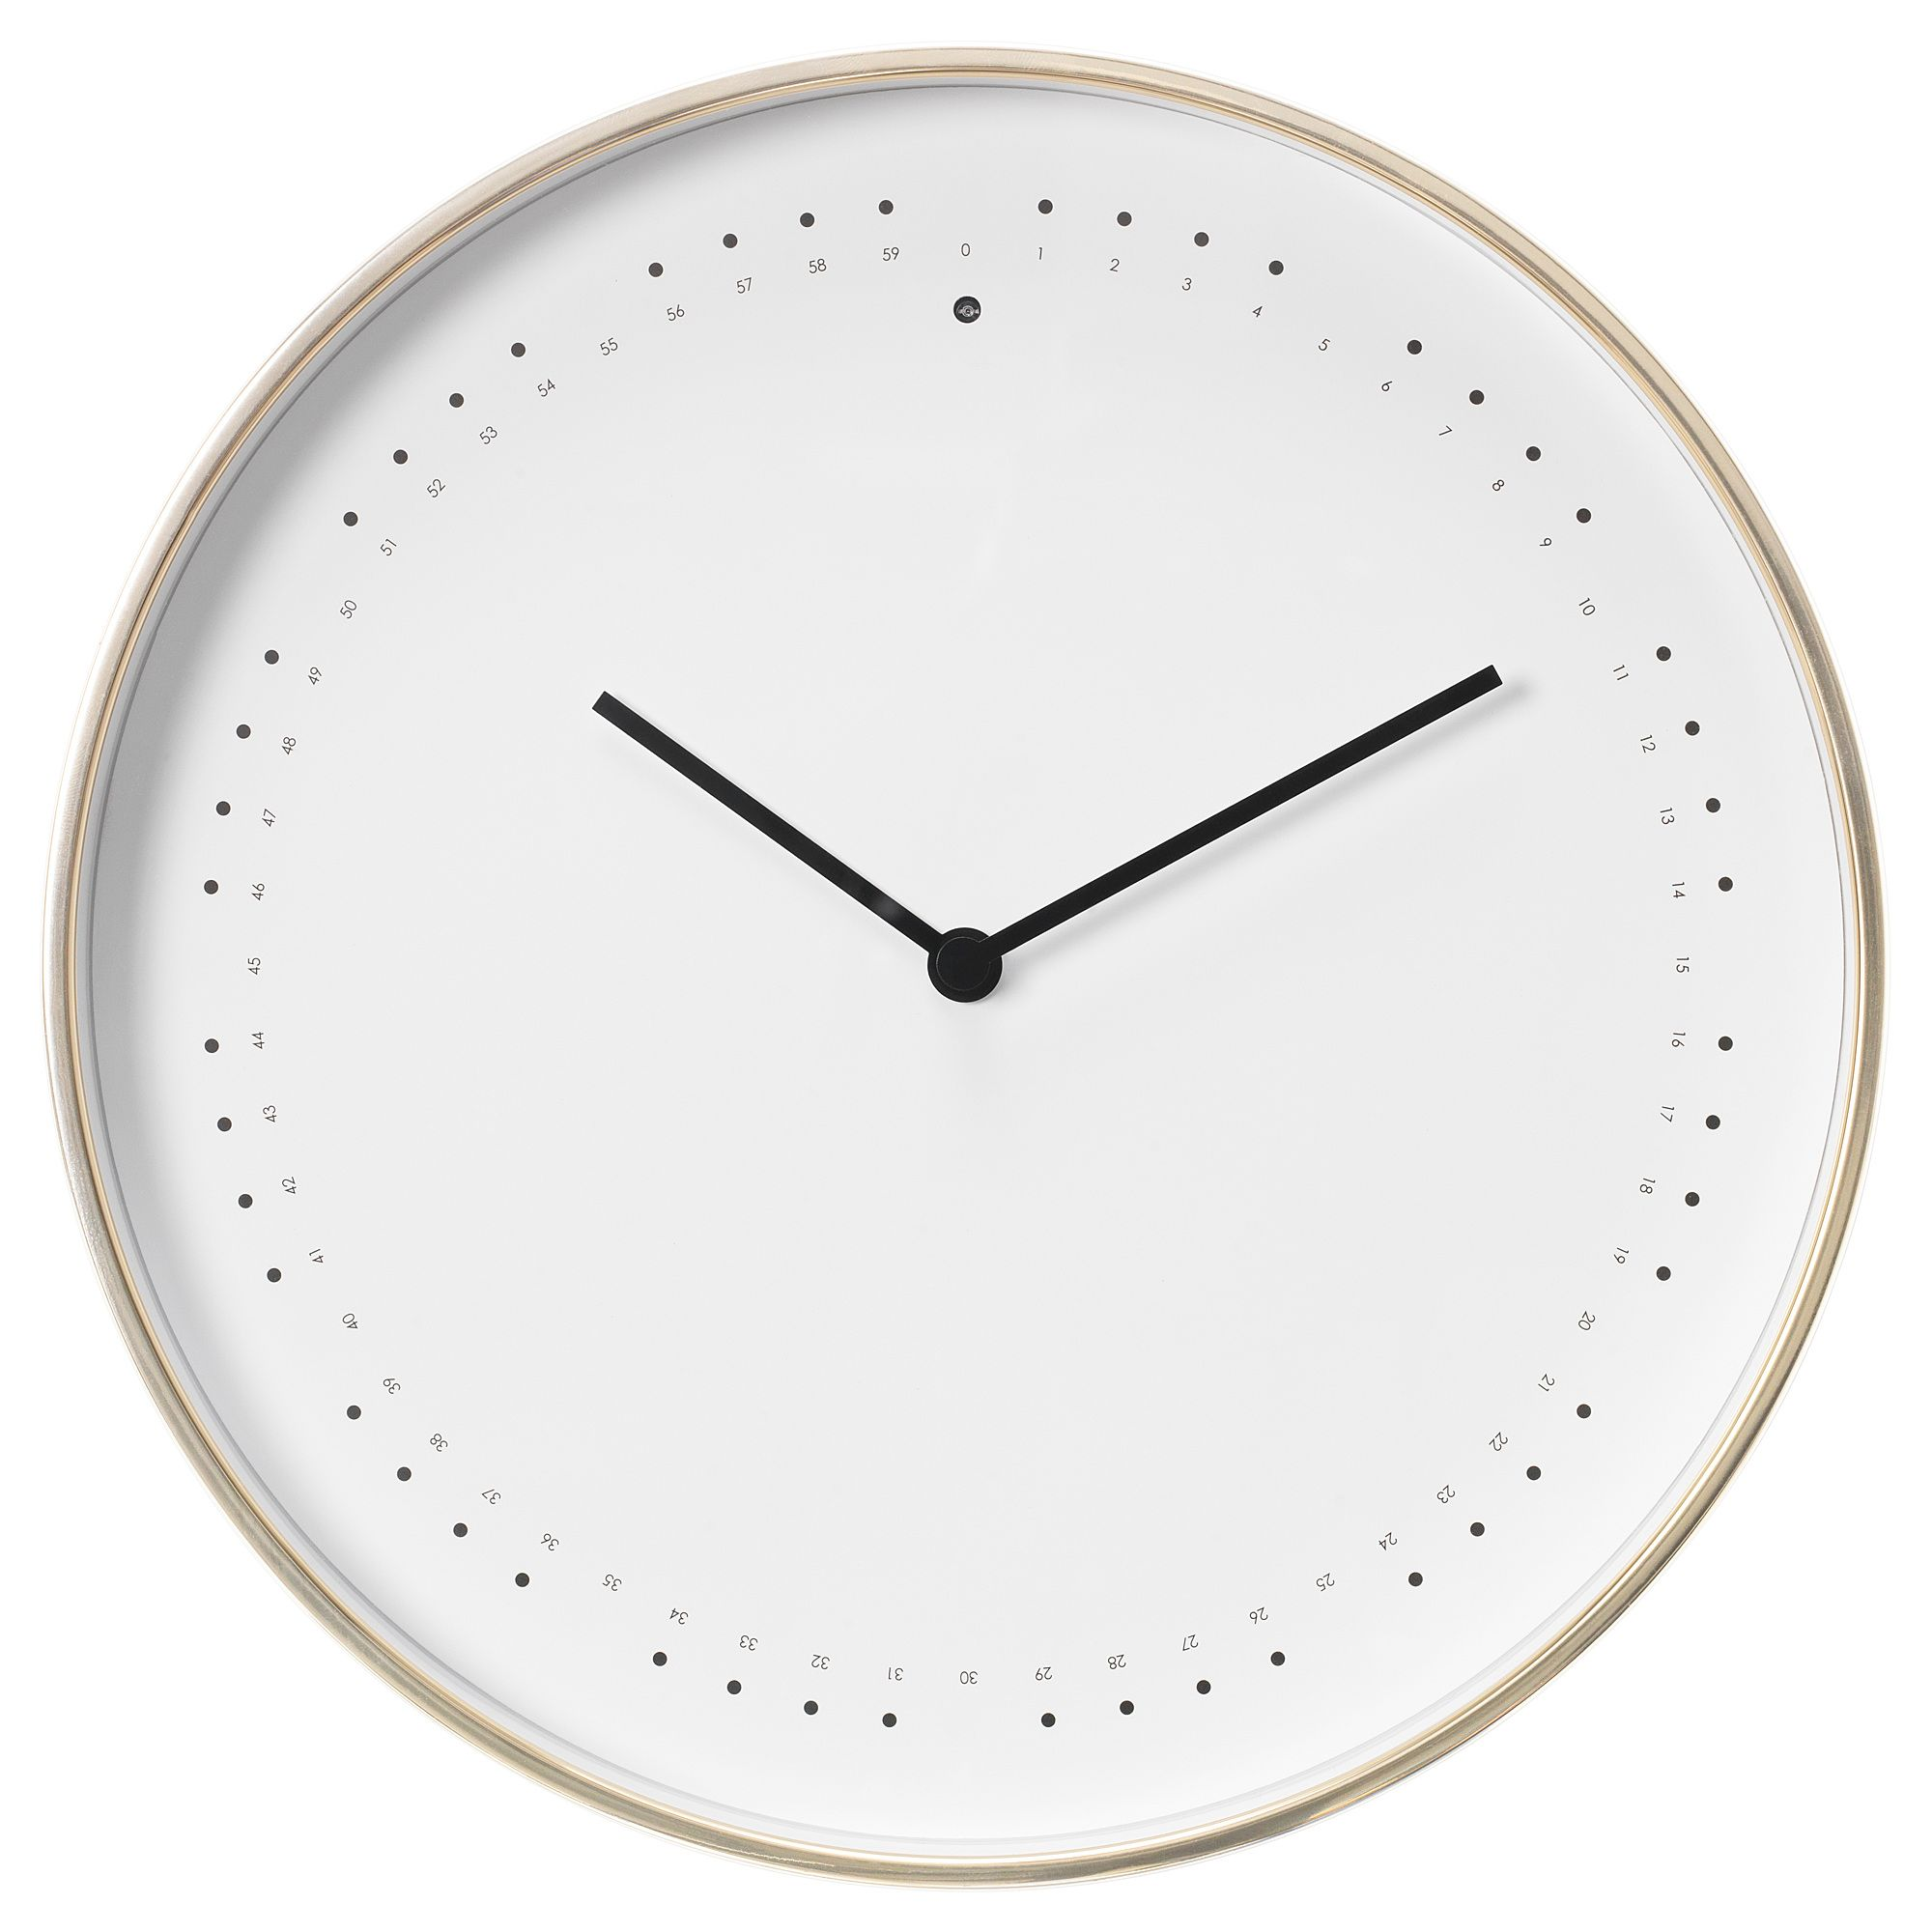 Panorera Wall Clock 9 24 Cm Wanduhr Ikea Wanduhren Uhren